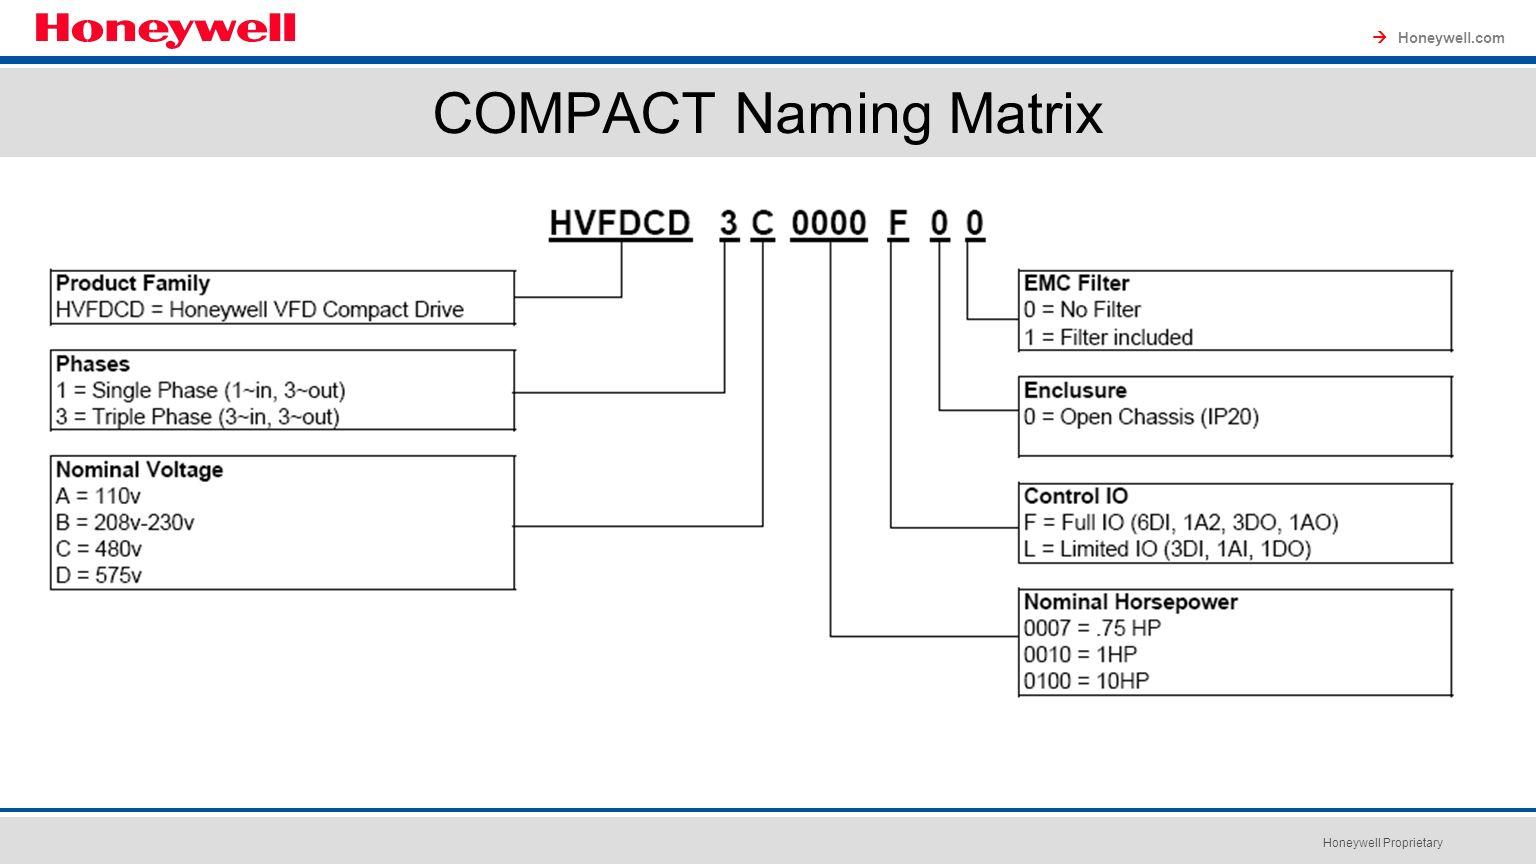 Compact Variable Frequency Drives Honeywell Proprietary Smart Vfd 12 Honeywellcom Naming Matrix